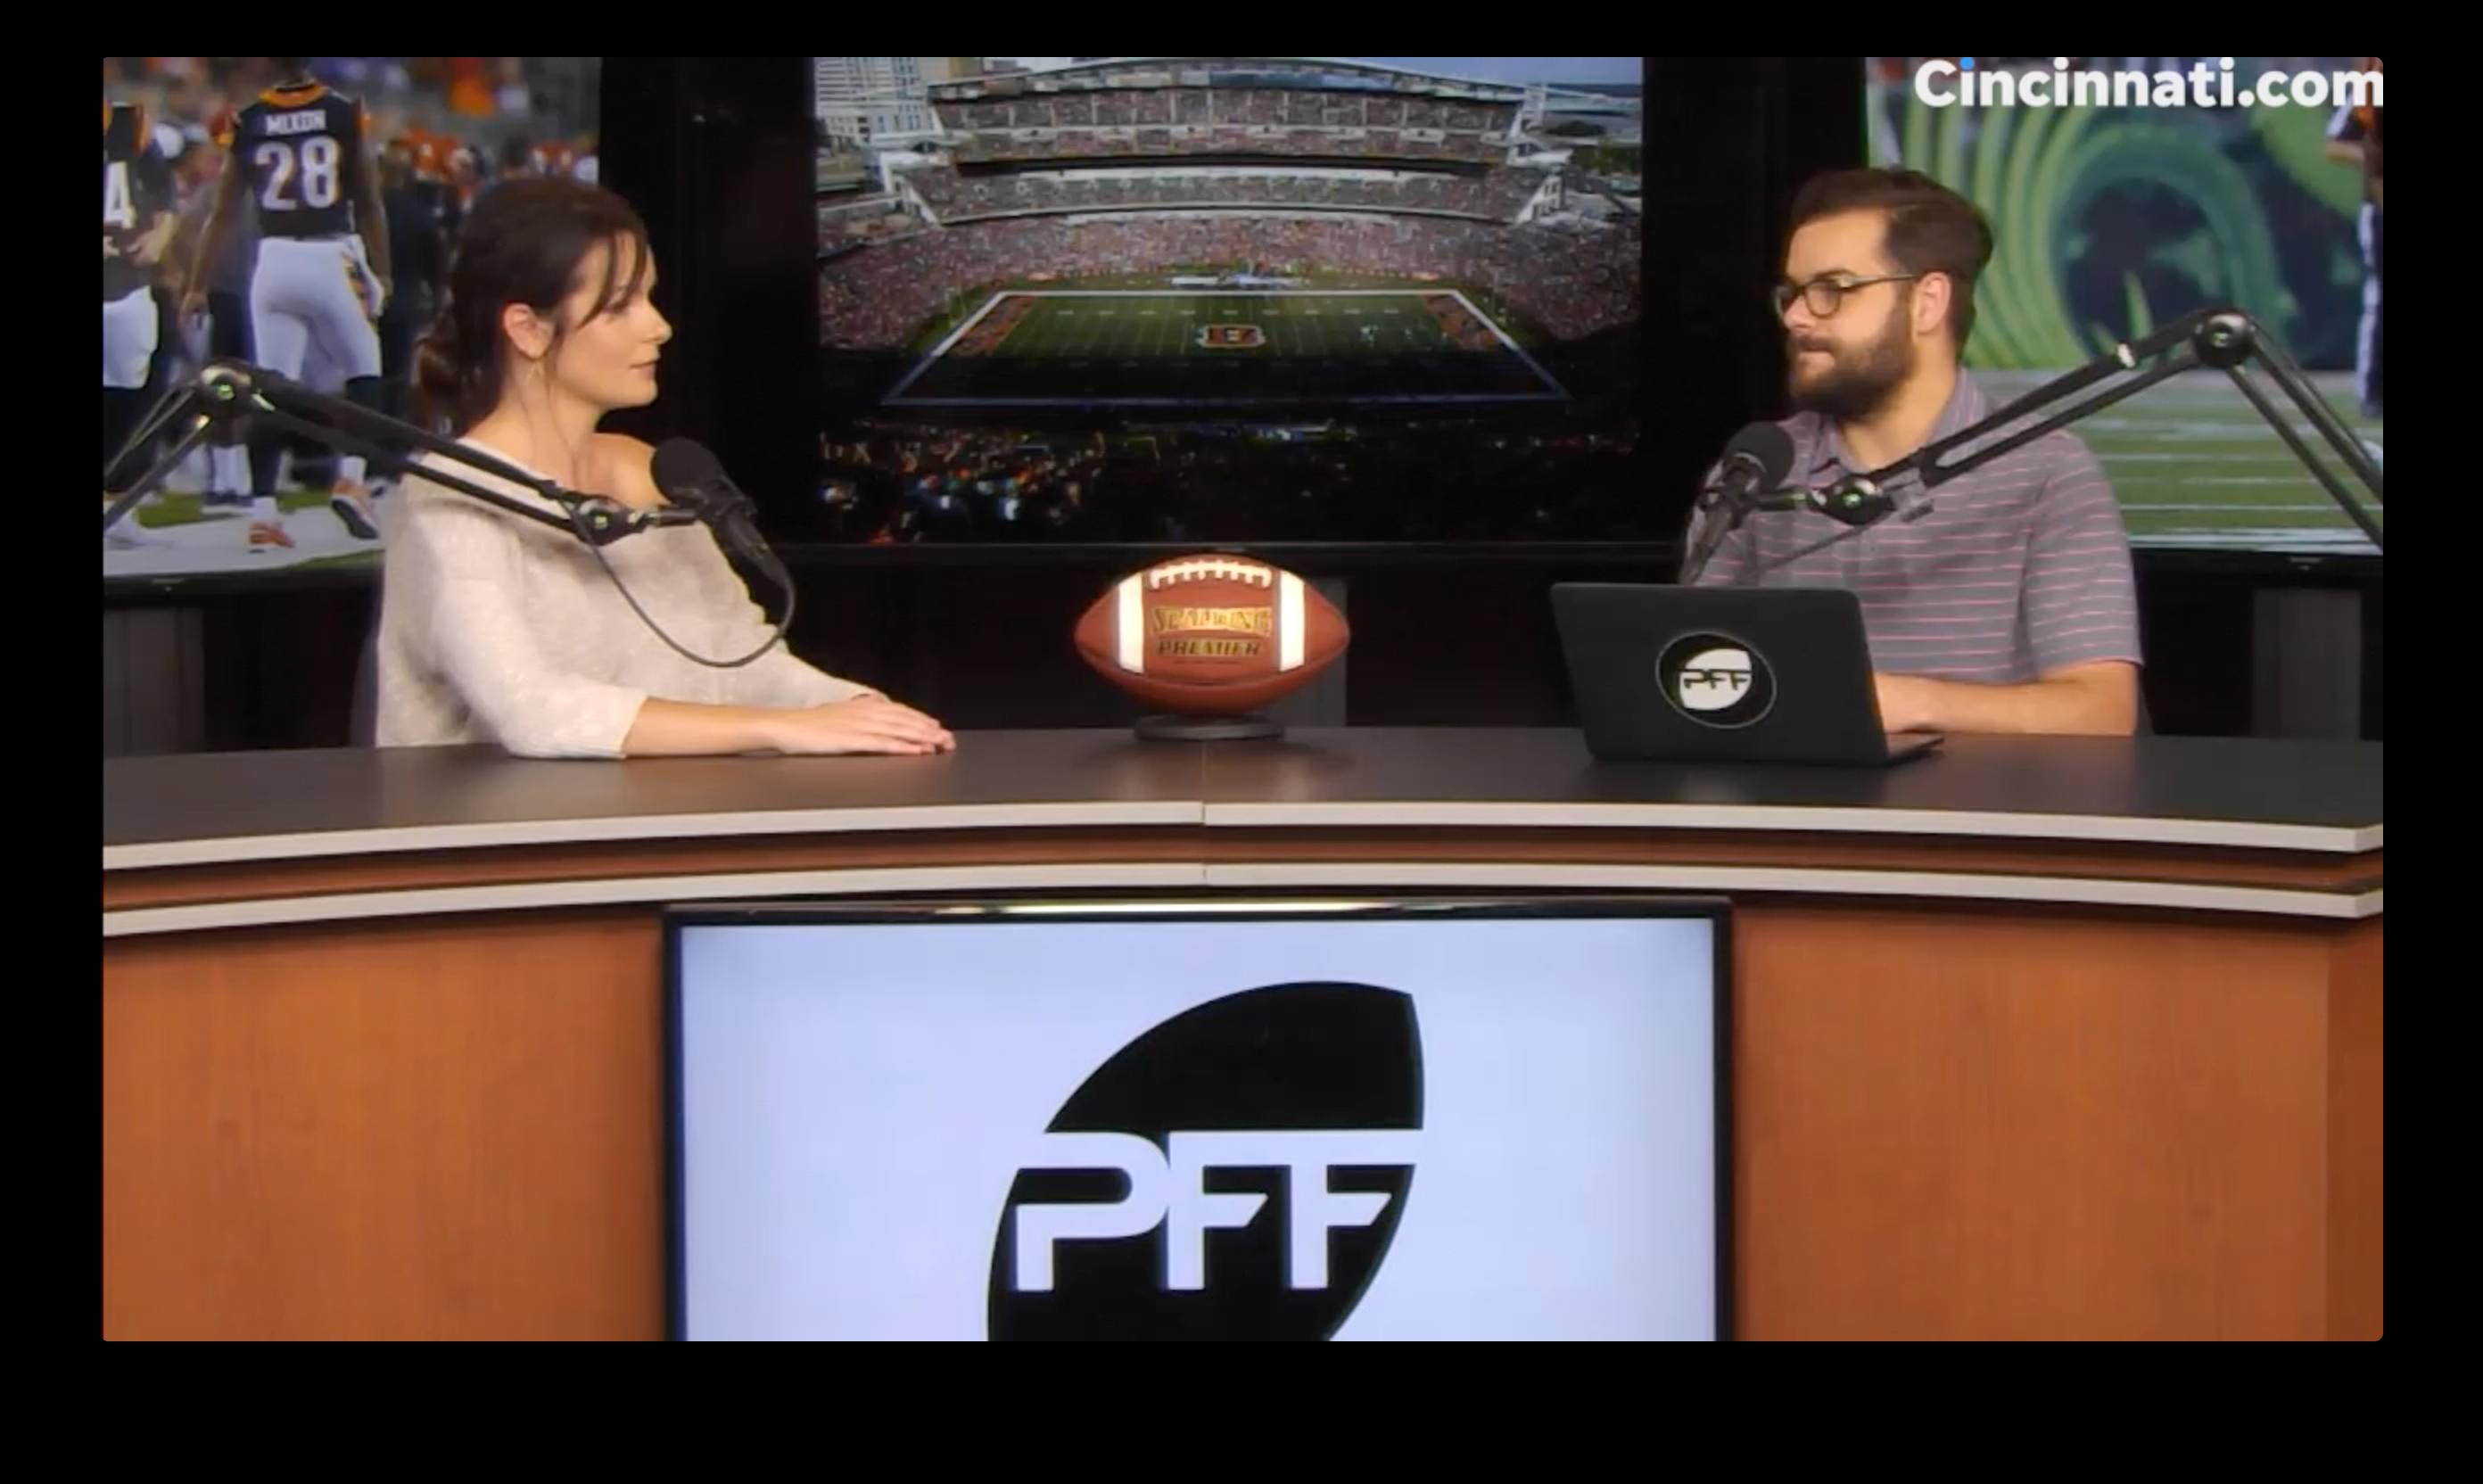 Cincinnati Bengals Podcast: PFF Lead Editor Austin Gayle on 0-7 start to NFL season